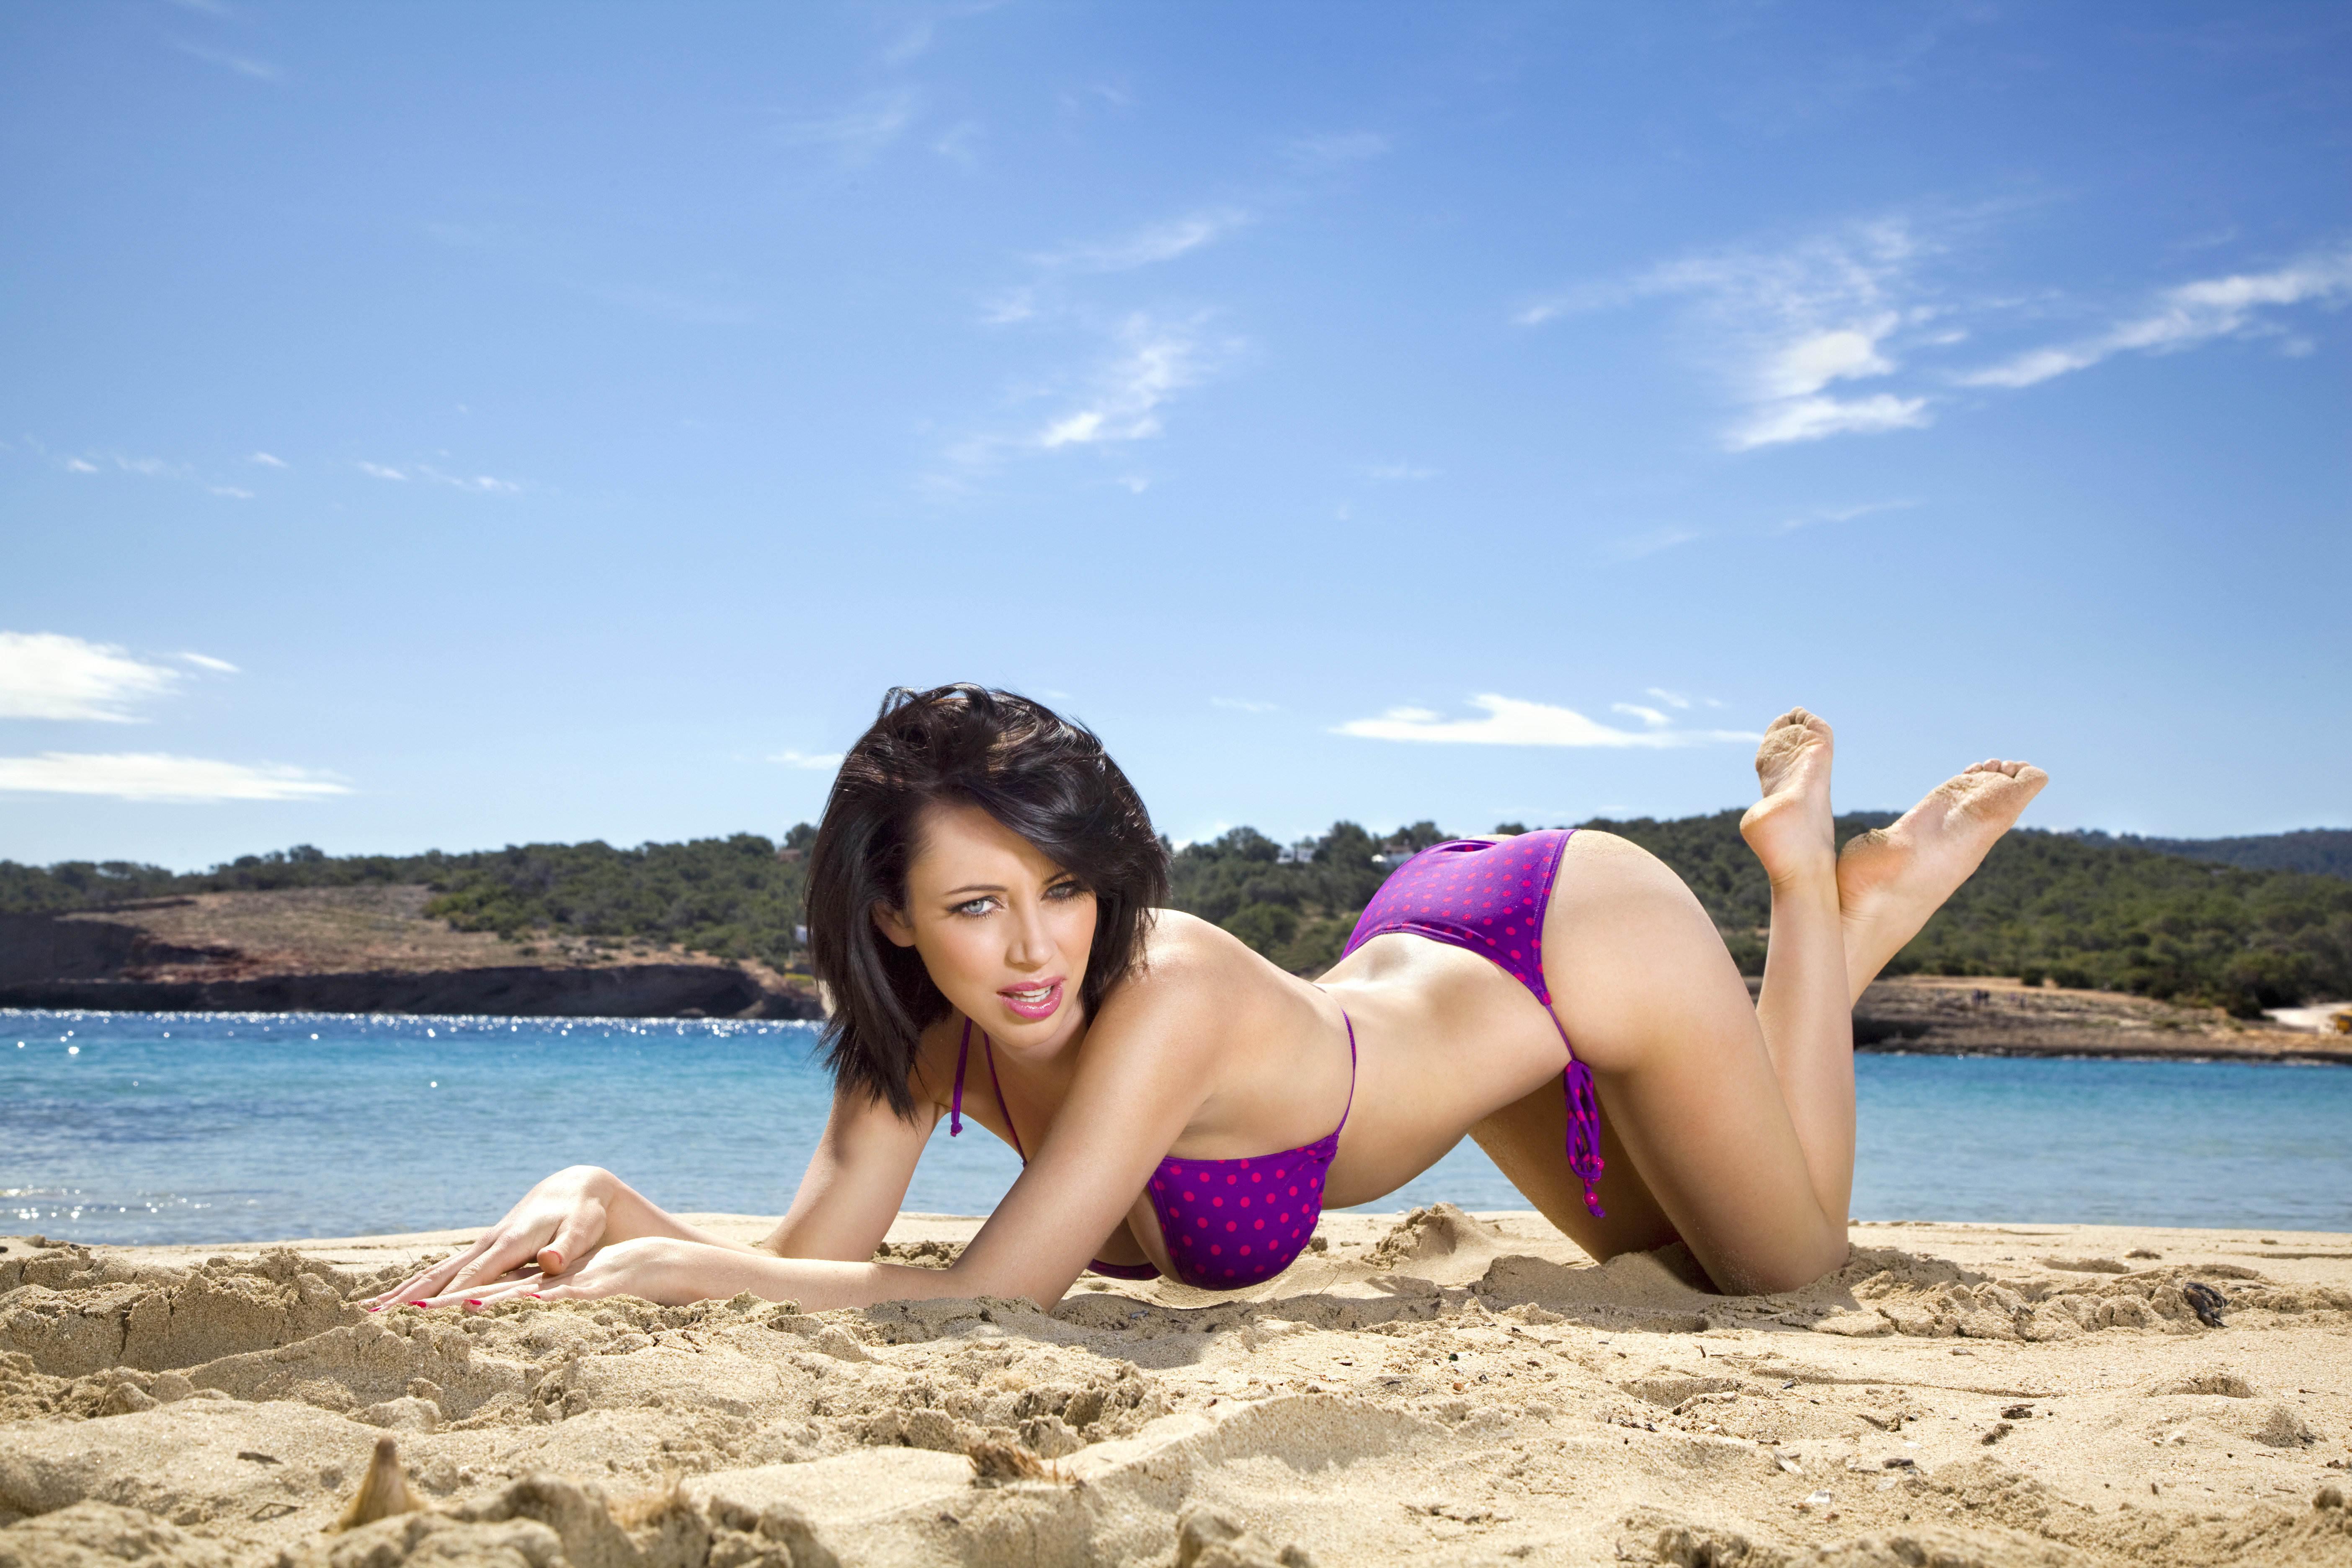 Фото модели на пляже 8 фотография